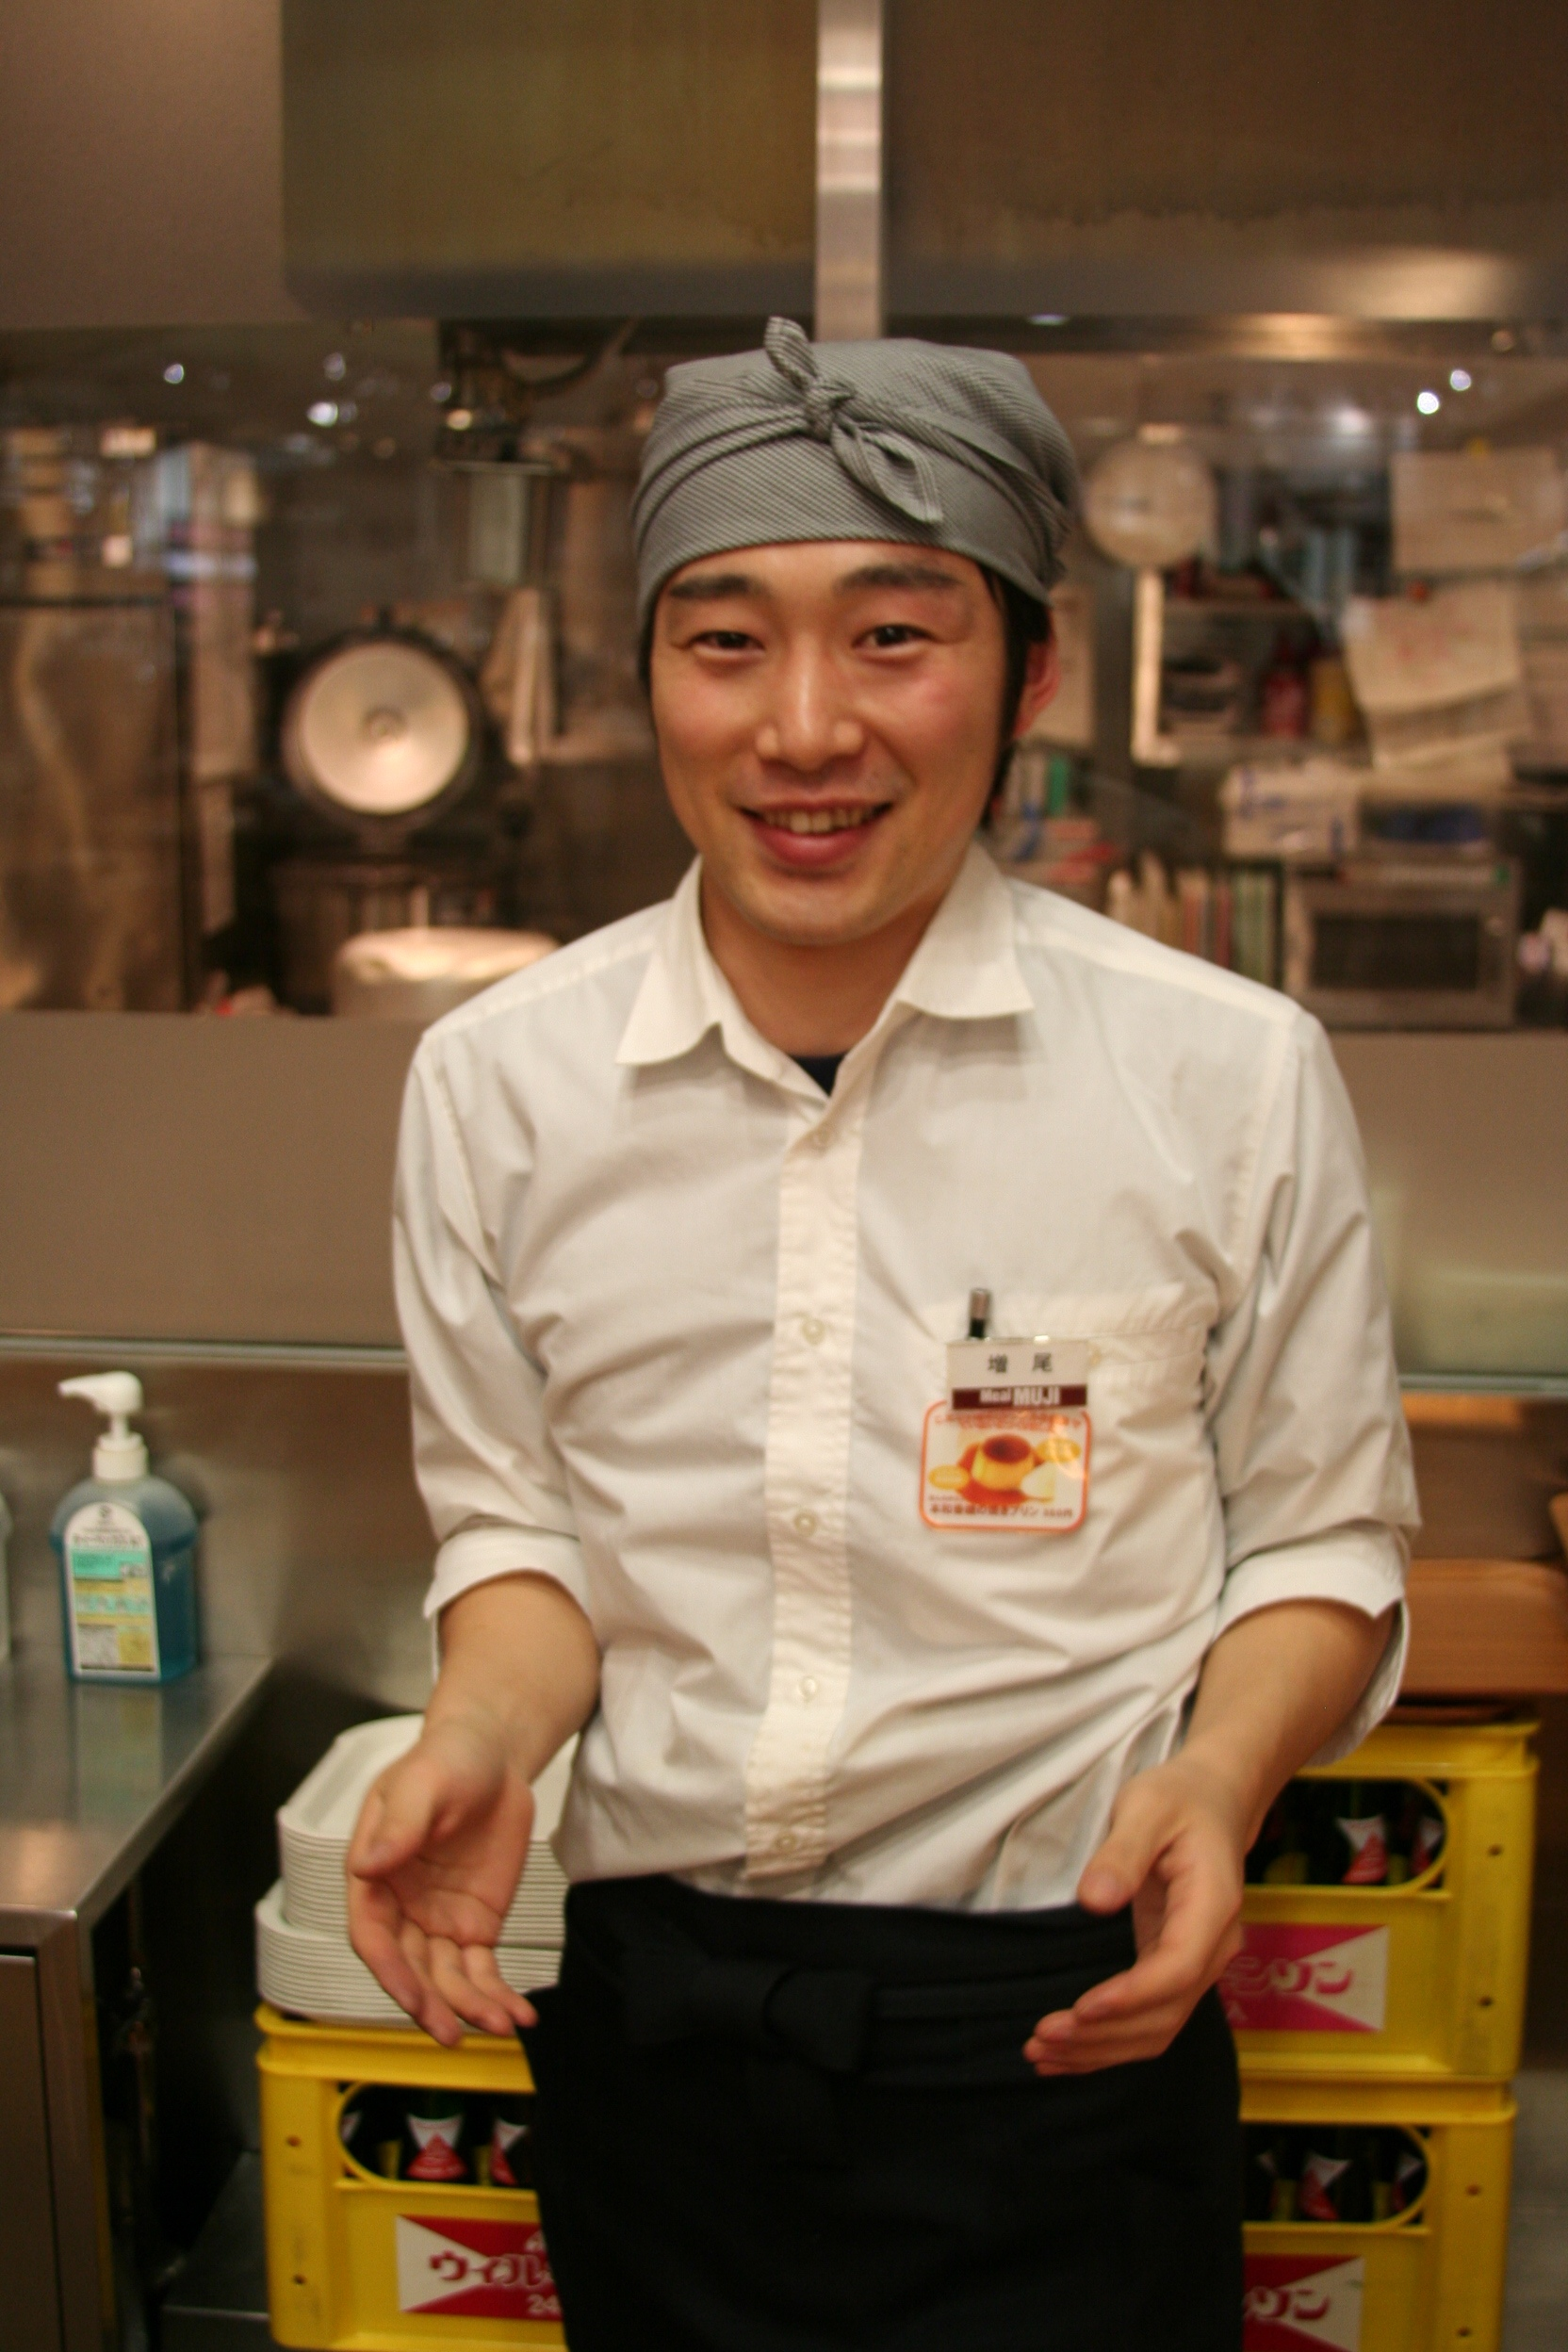 Becoming a Muji meal man